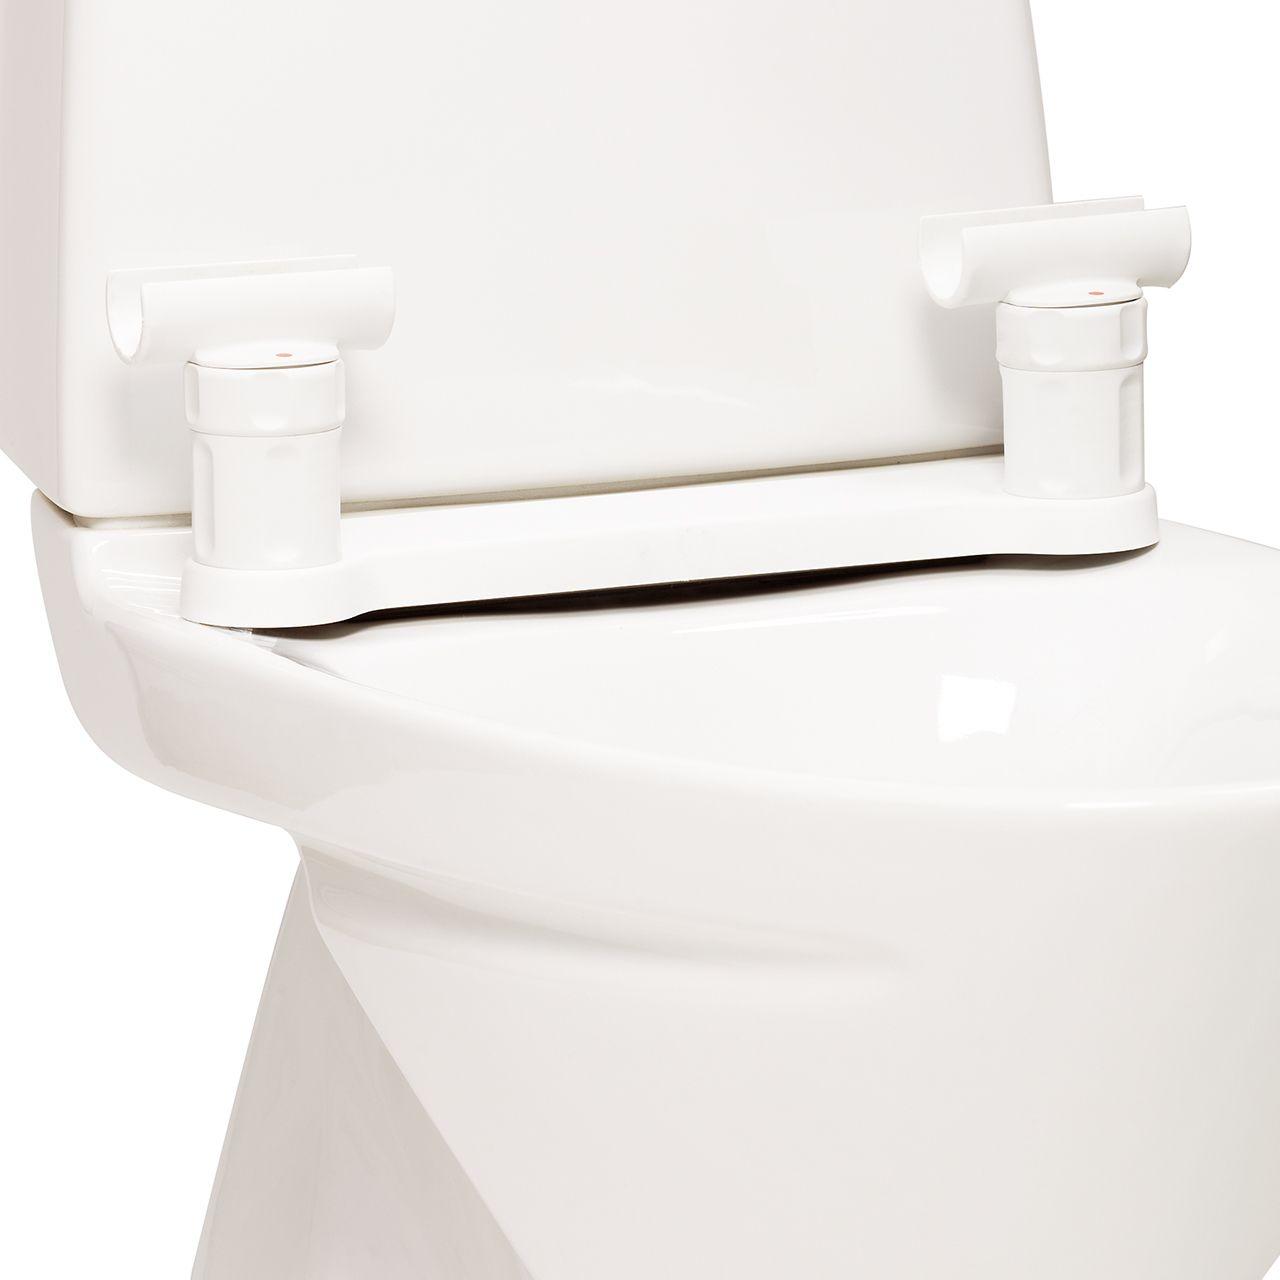 cloo toiletverhoger detail